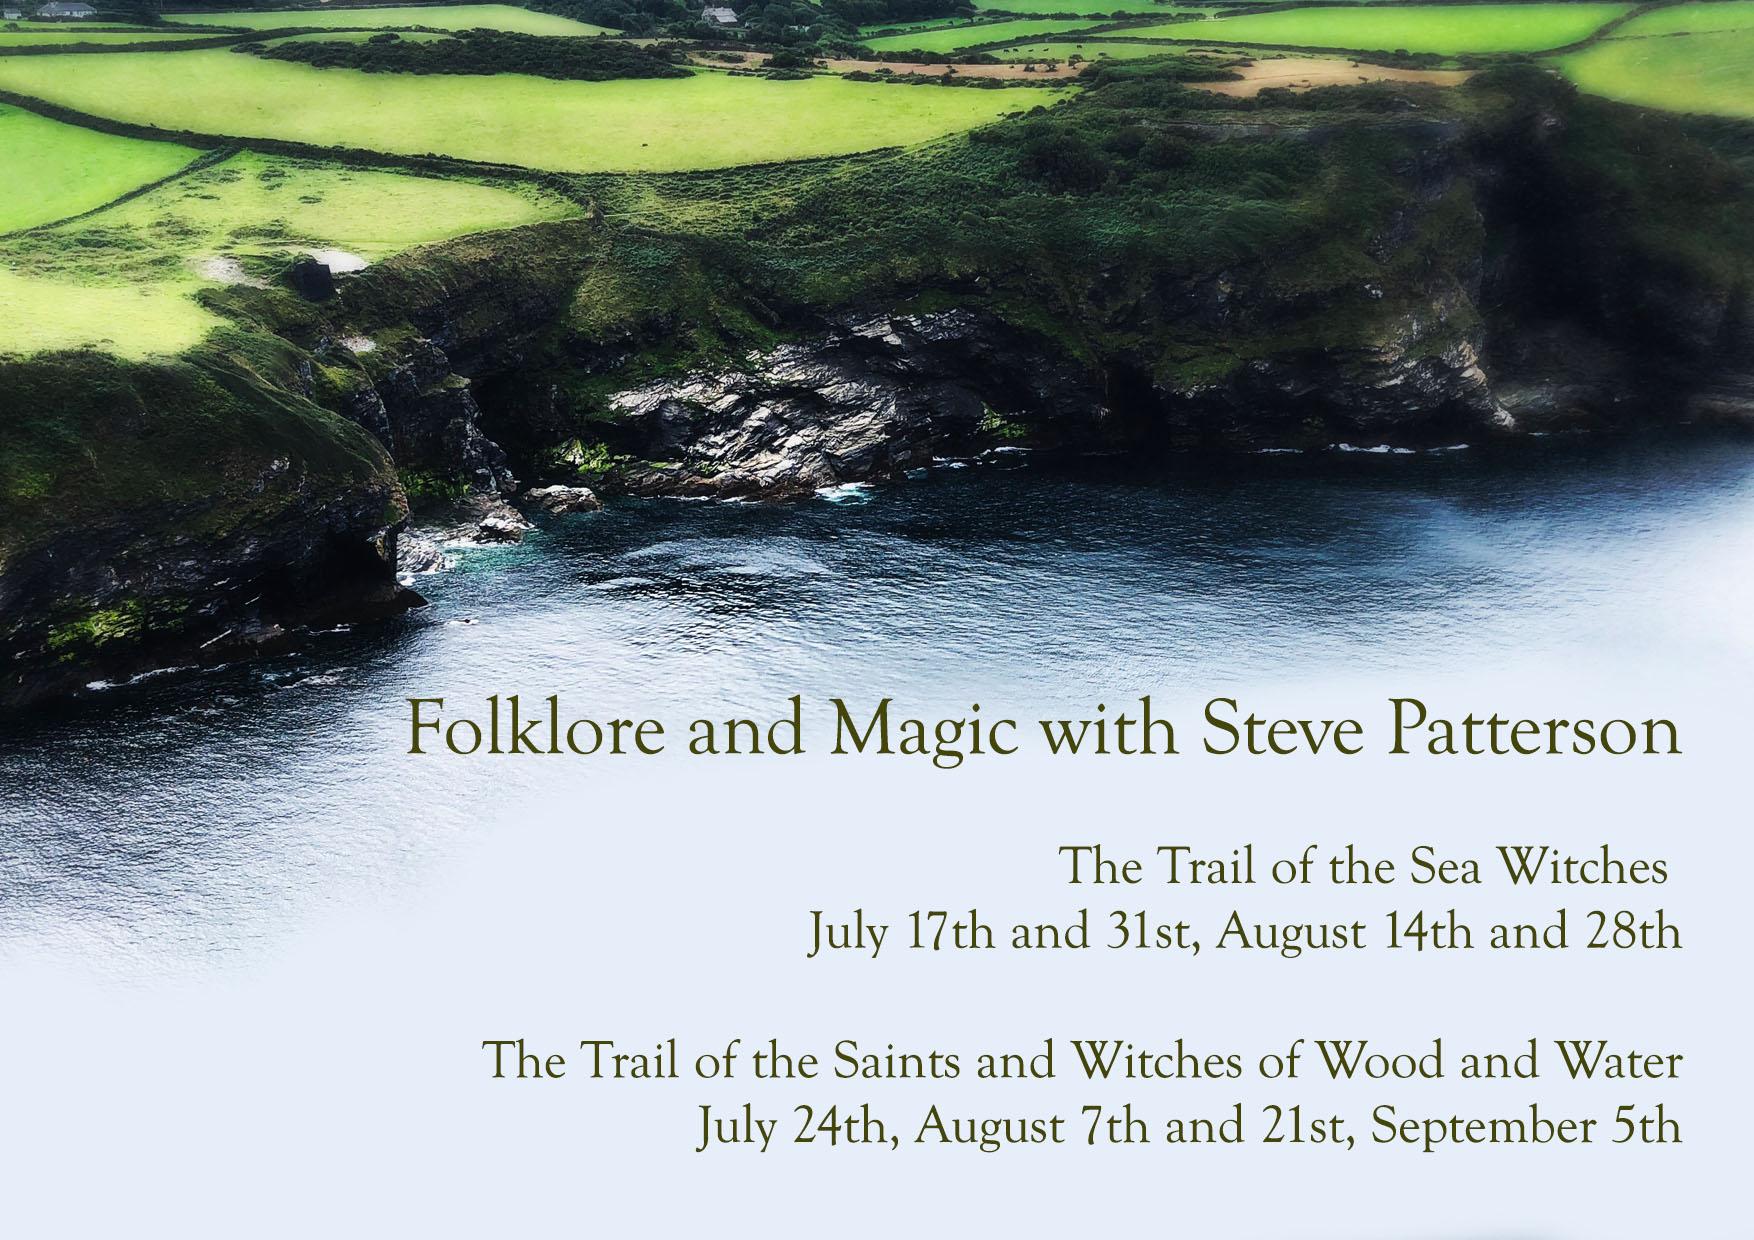 Folklore and Magic walks around Boscastle